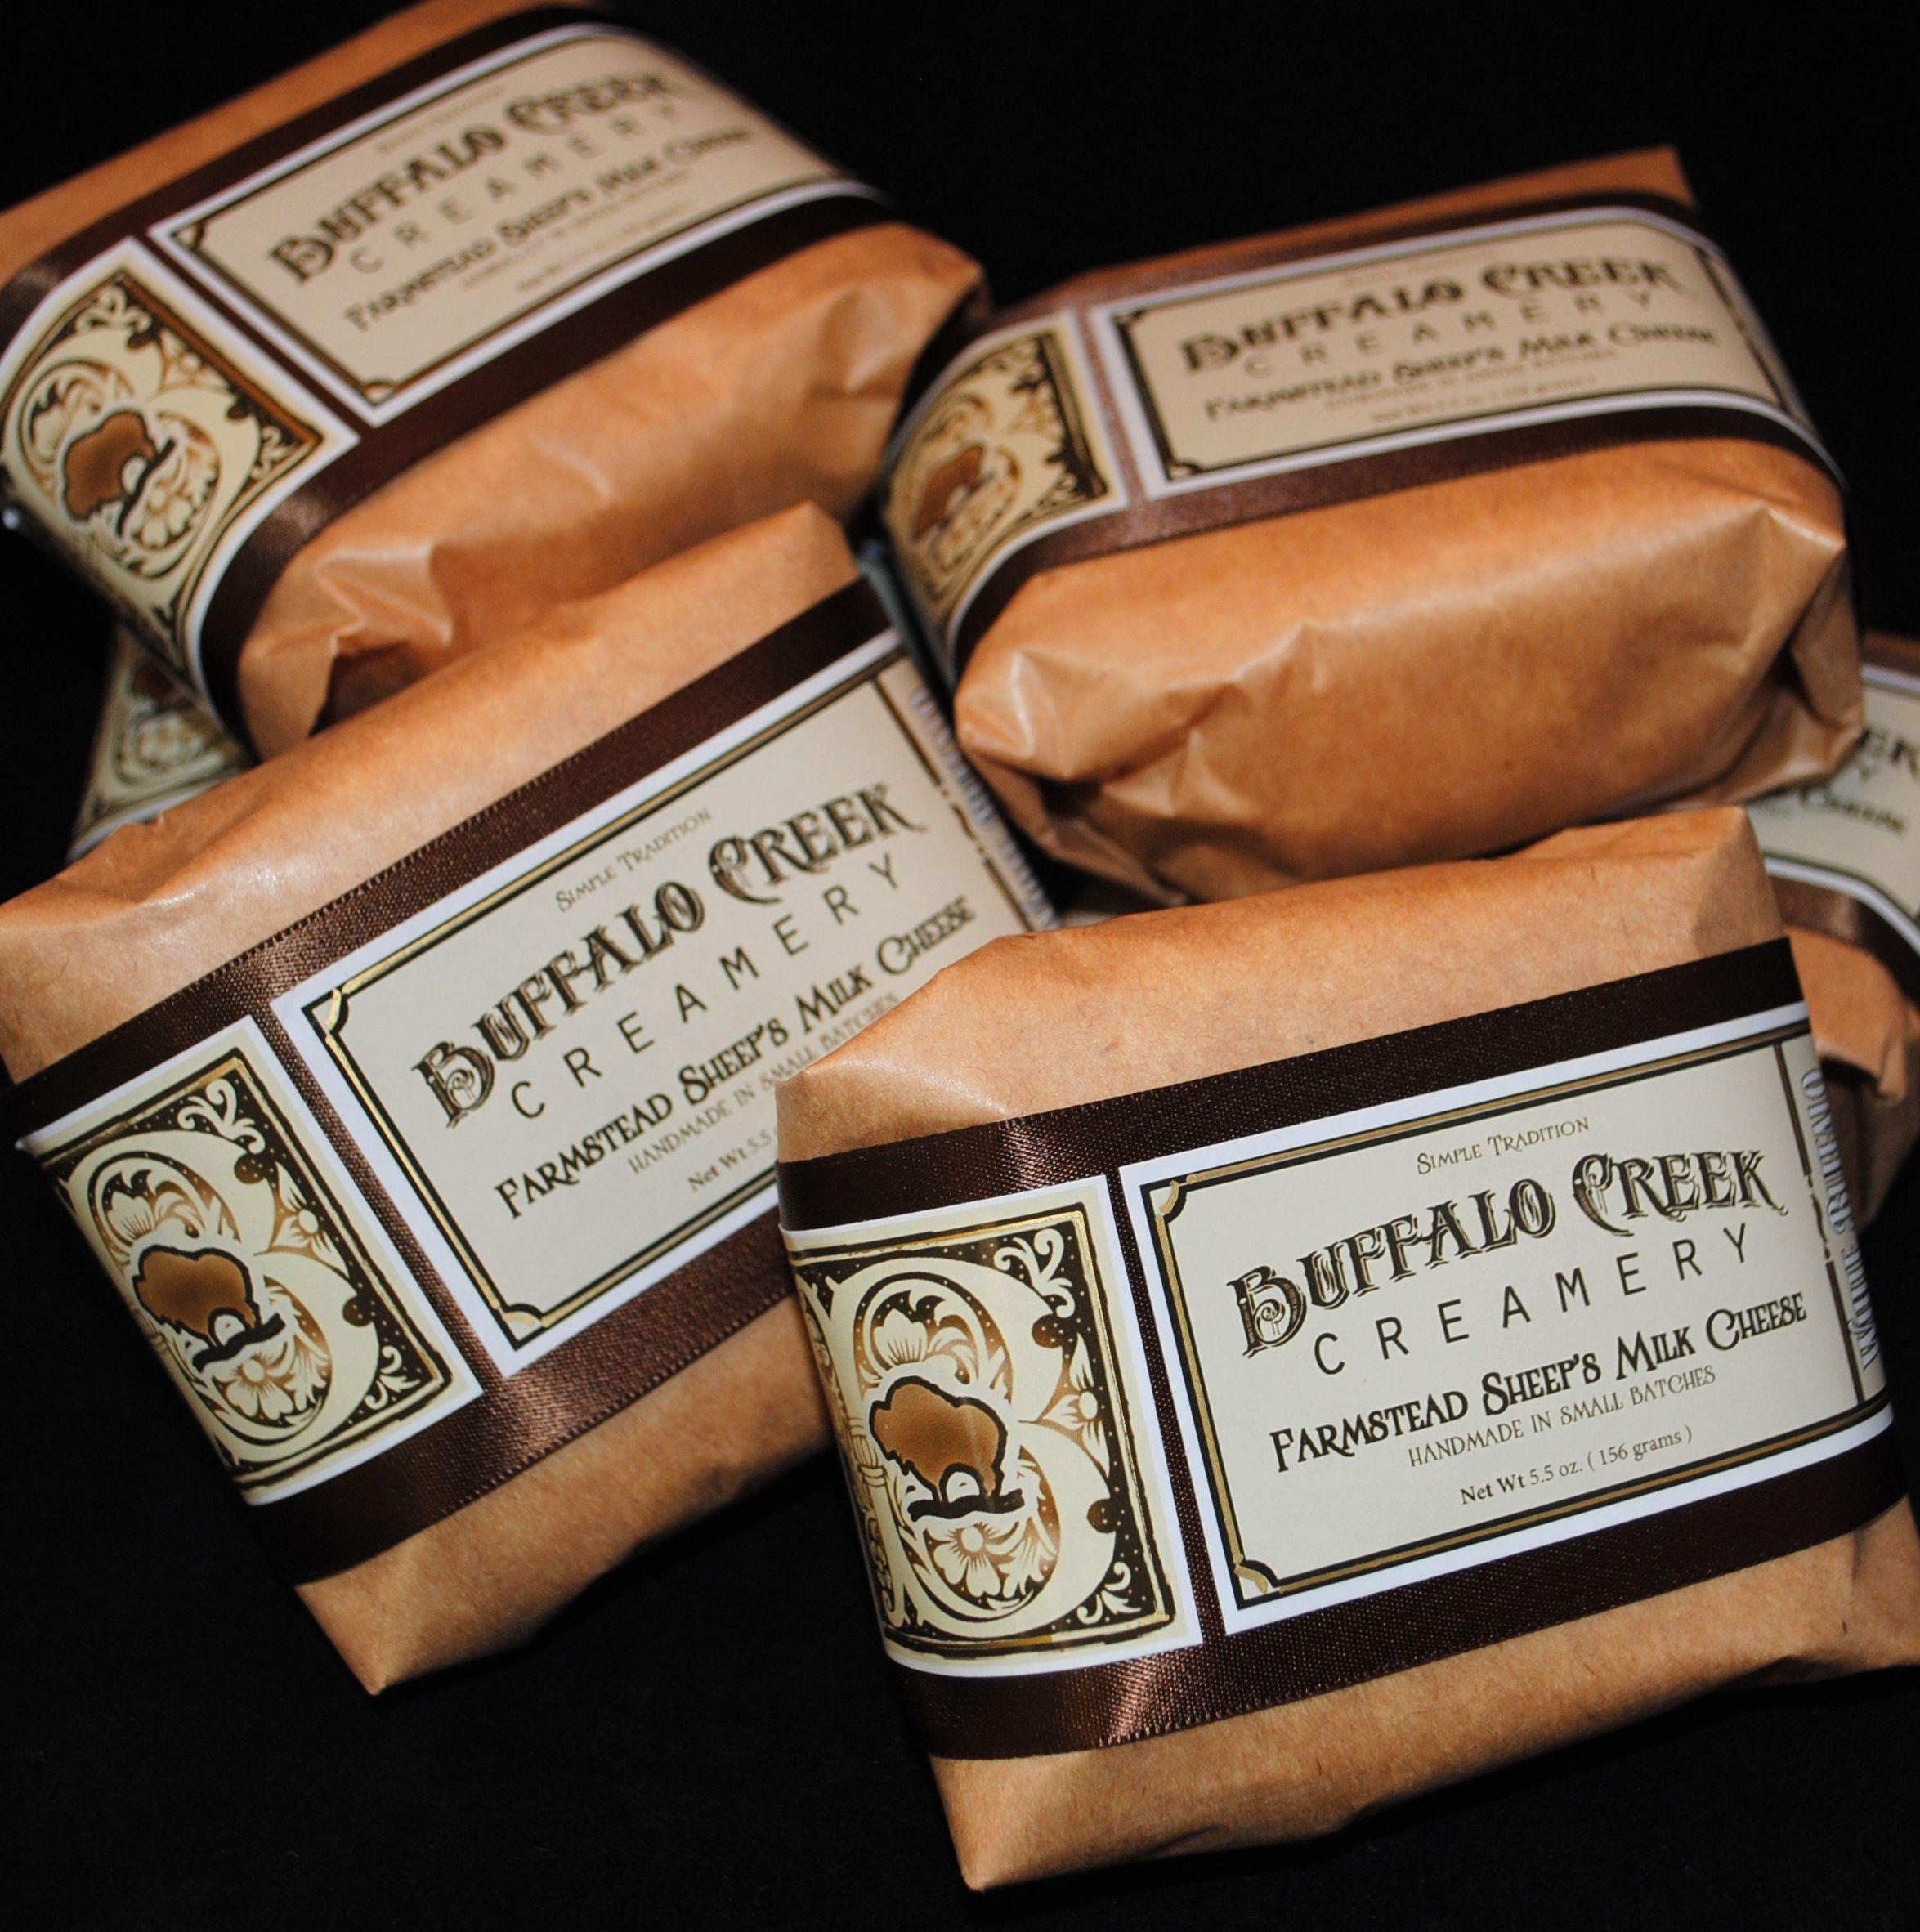 Farmstead sheeps milk cheese from buffalo creek creamery